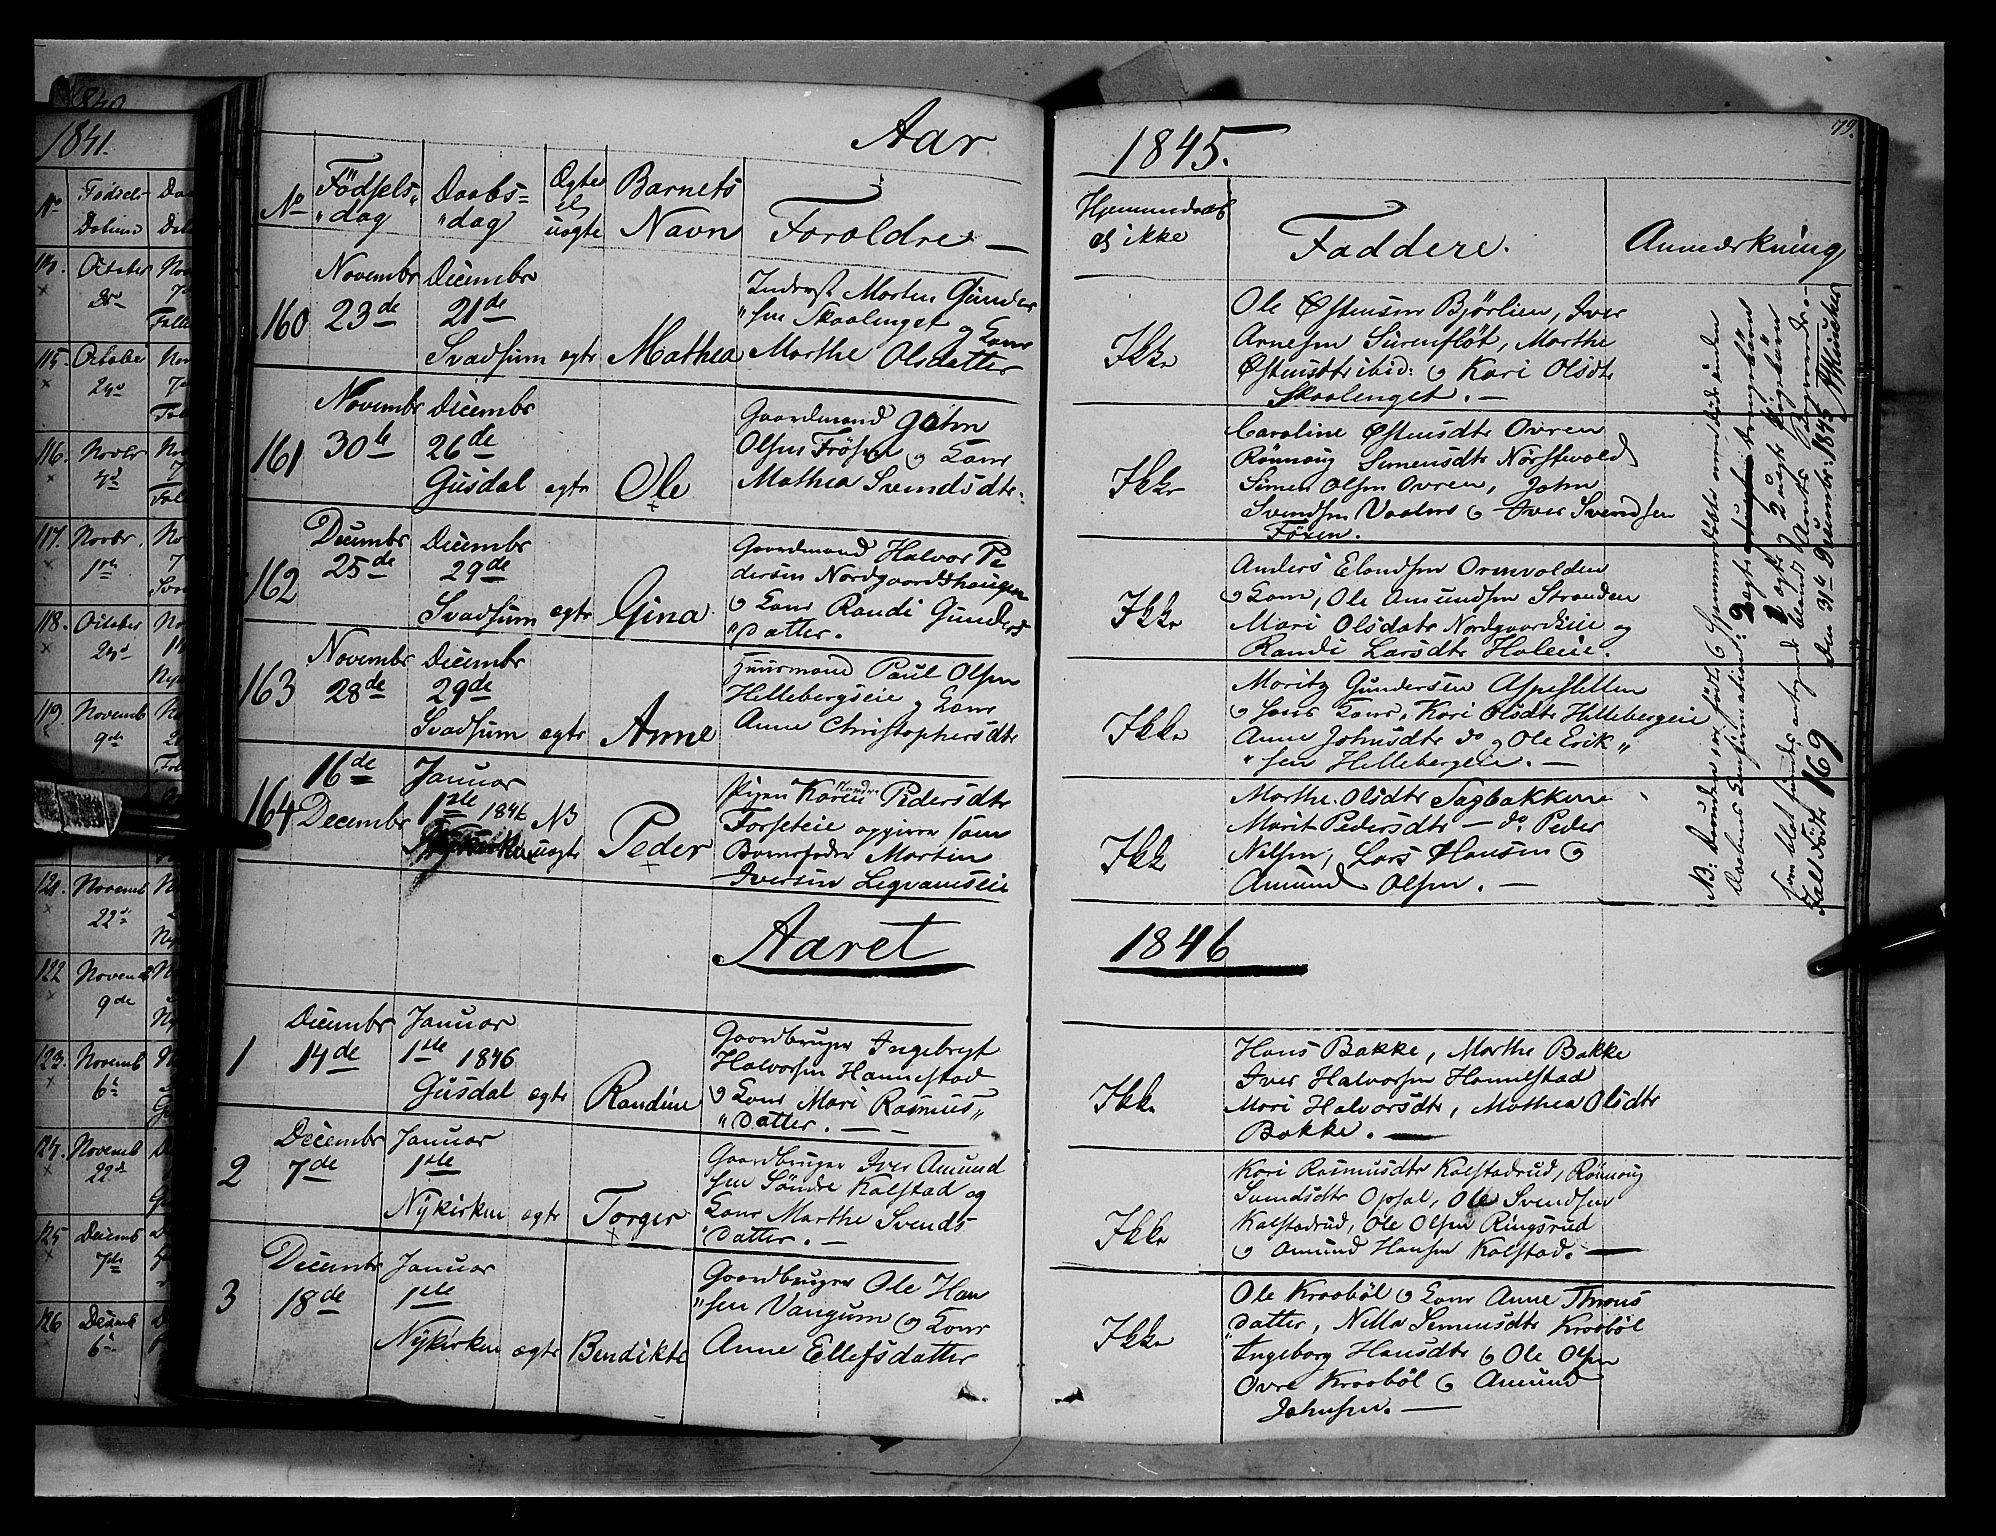 SAH, Gausdal prestekontor, Ministerialbok nr. 7, 1840-1850, s. 79